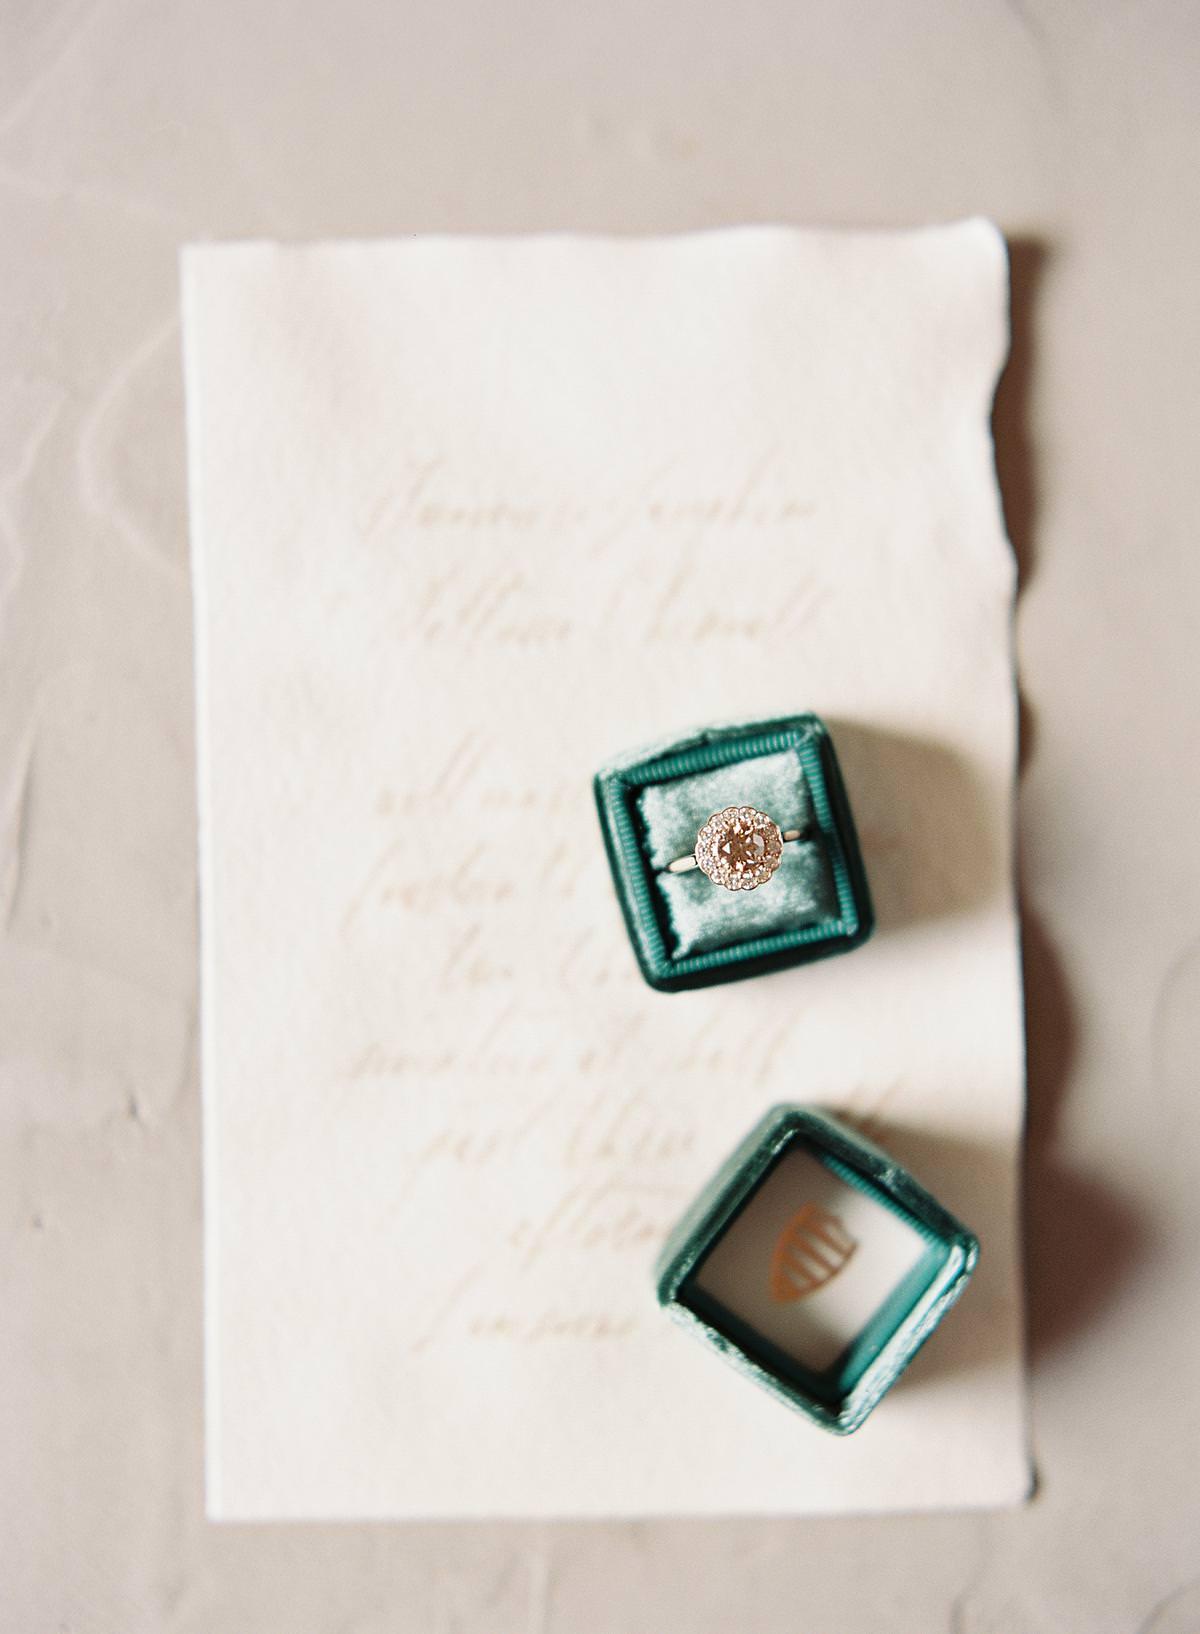 wedding ring on film